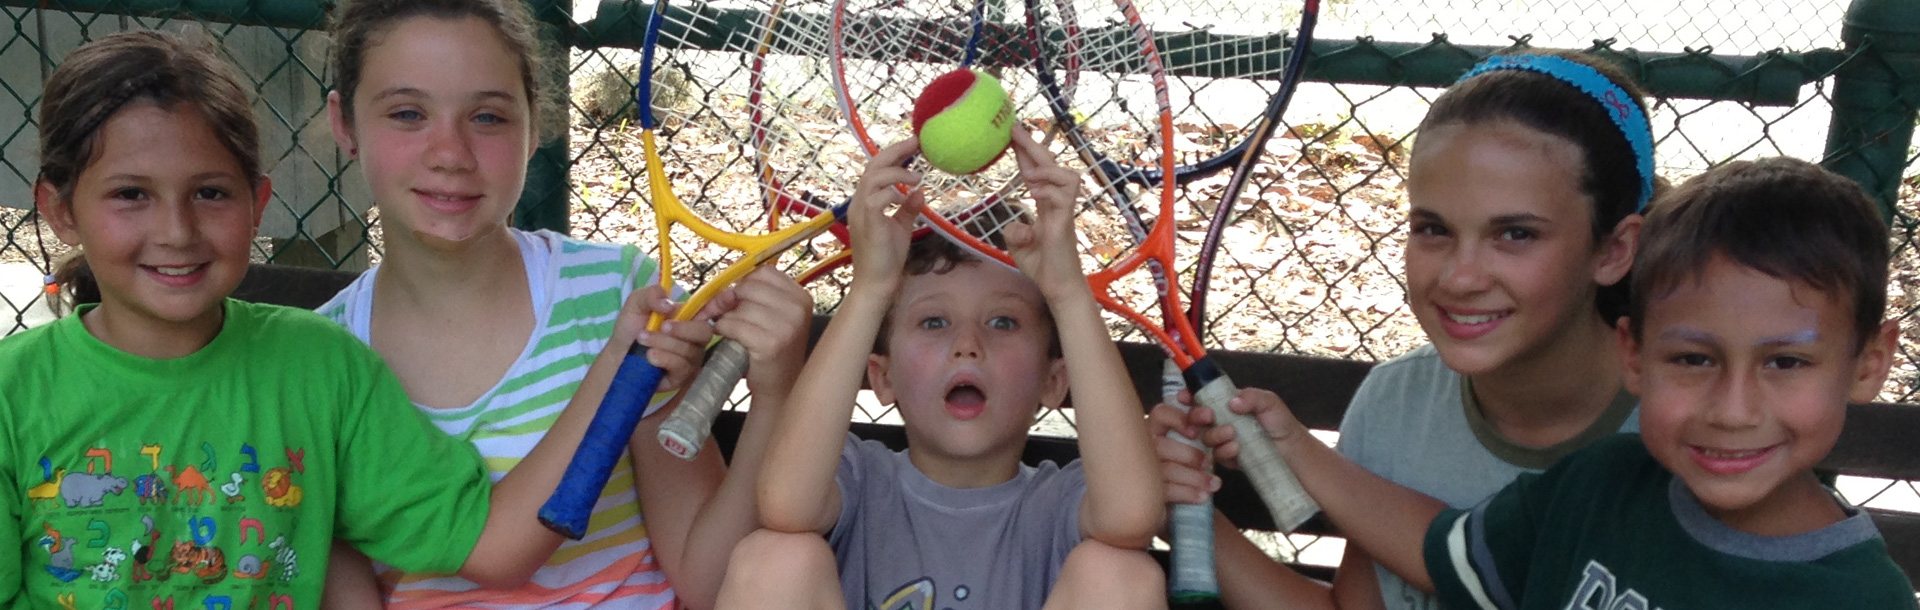 tennis-time-slide-07